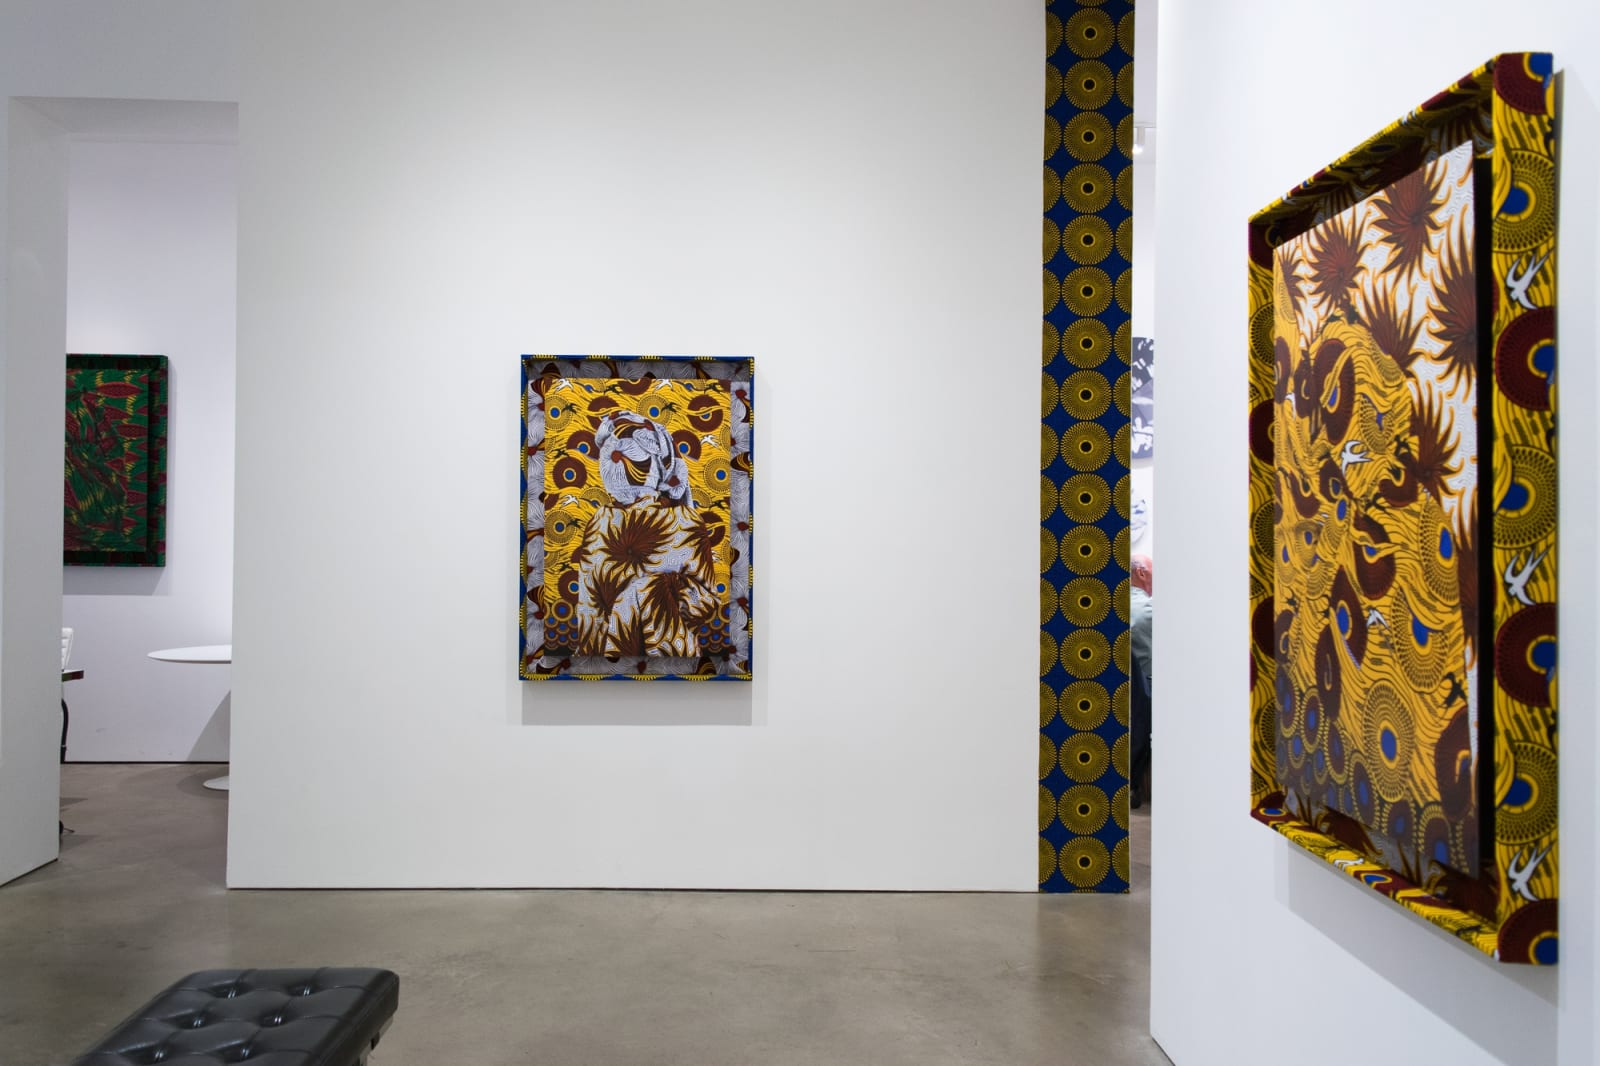 Alia Ali: Cartographies of Pattern